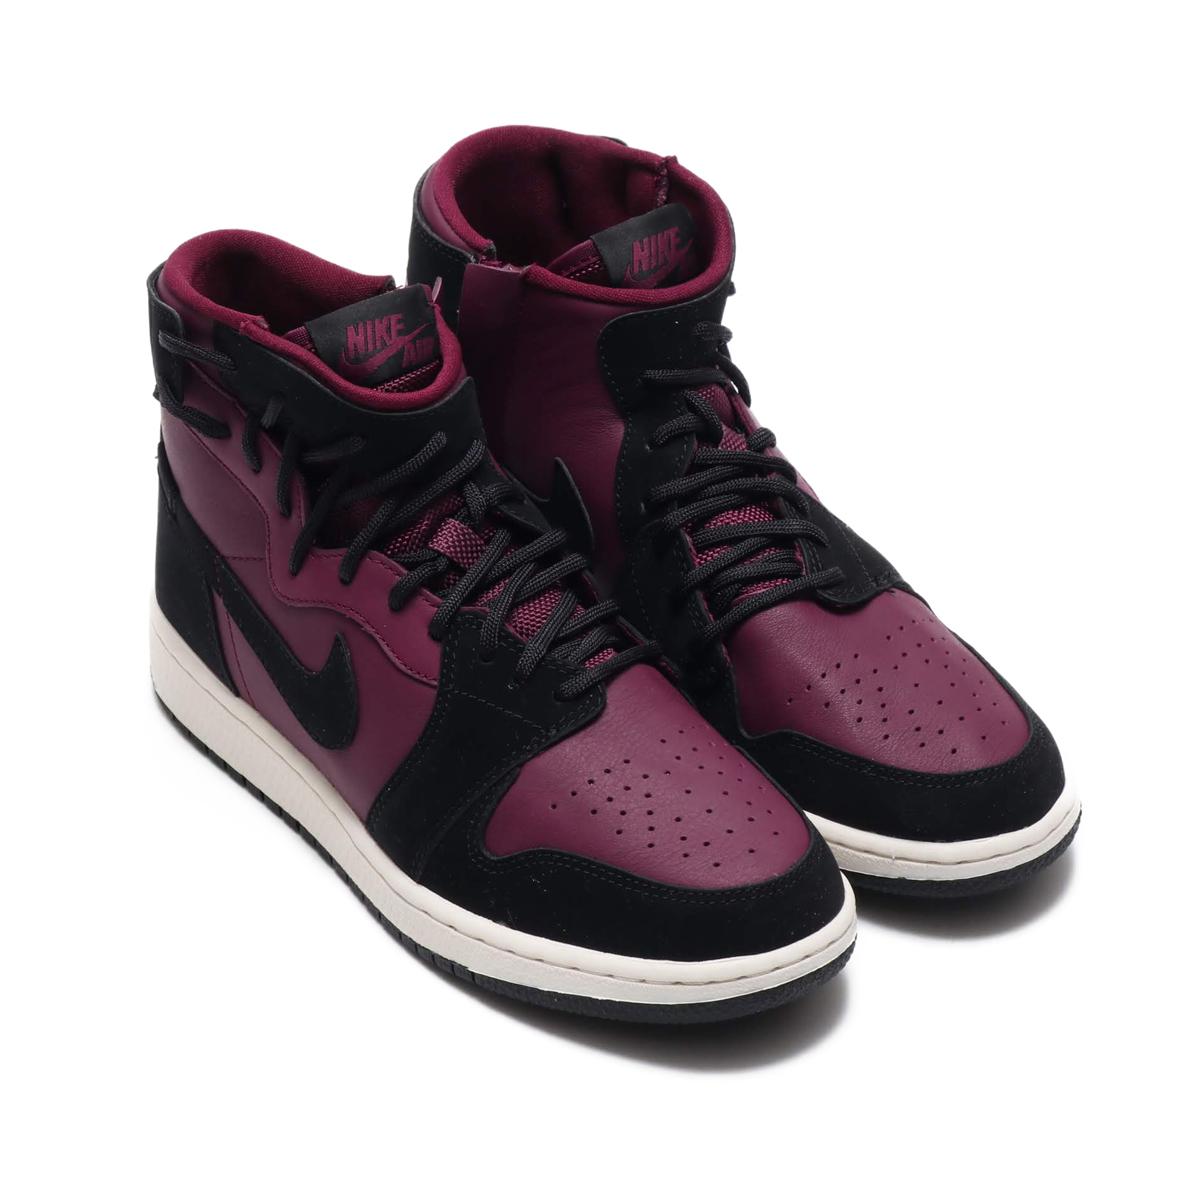 18fa XxBordeauxblack Jordan Wmns Women Black 1 Phantom Air Rebel Nike S Xxnike OiZuTPkX